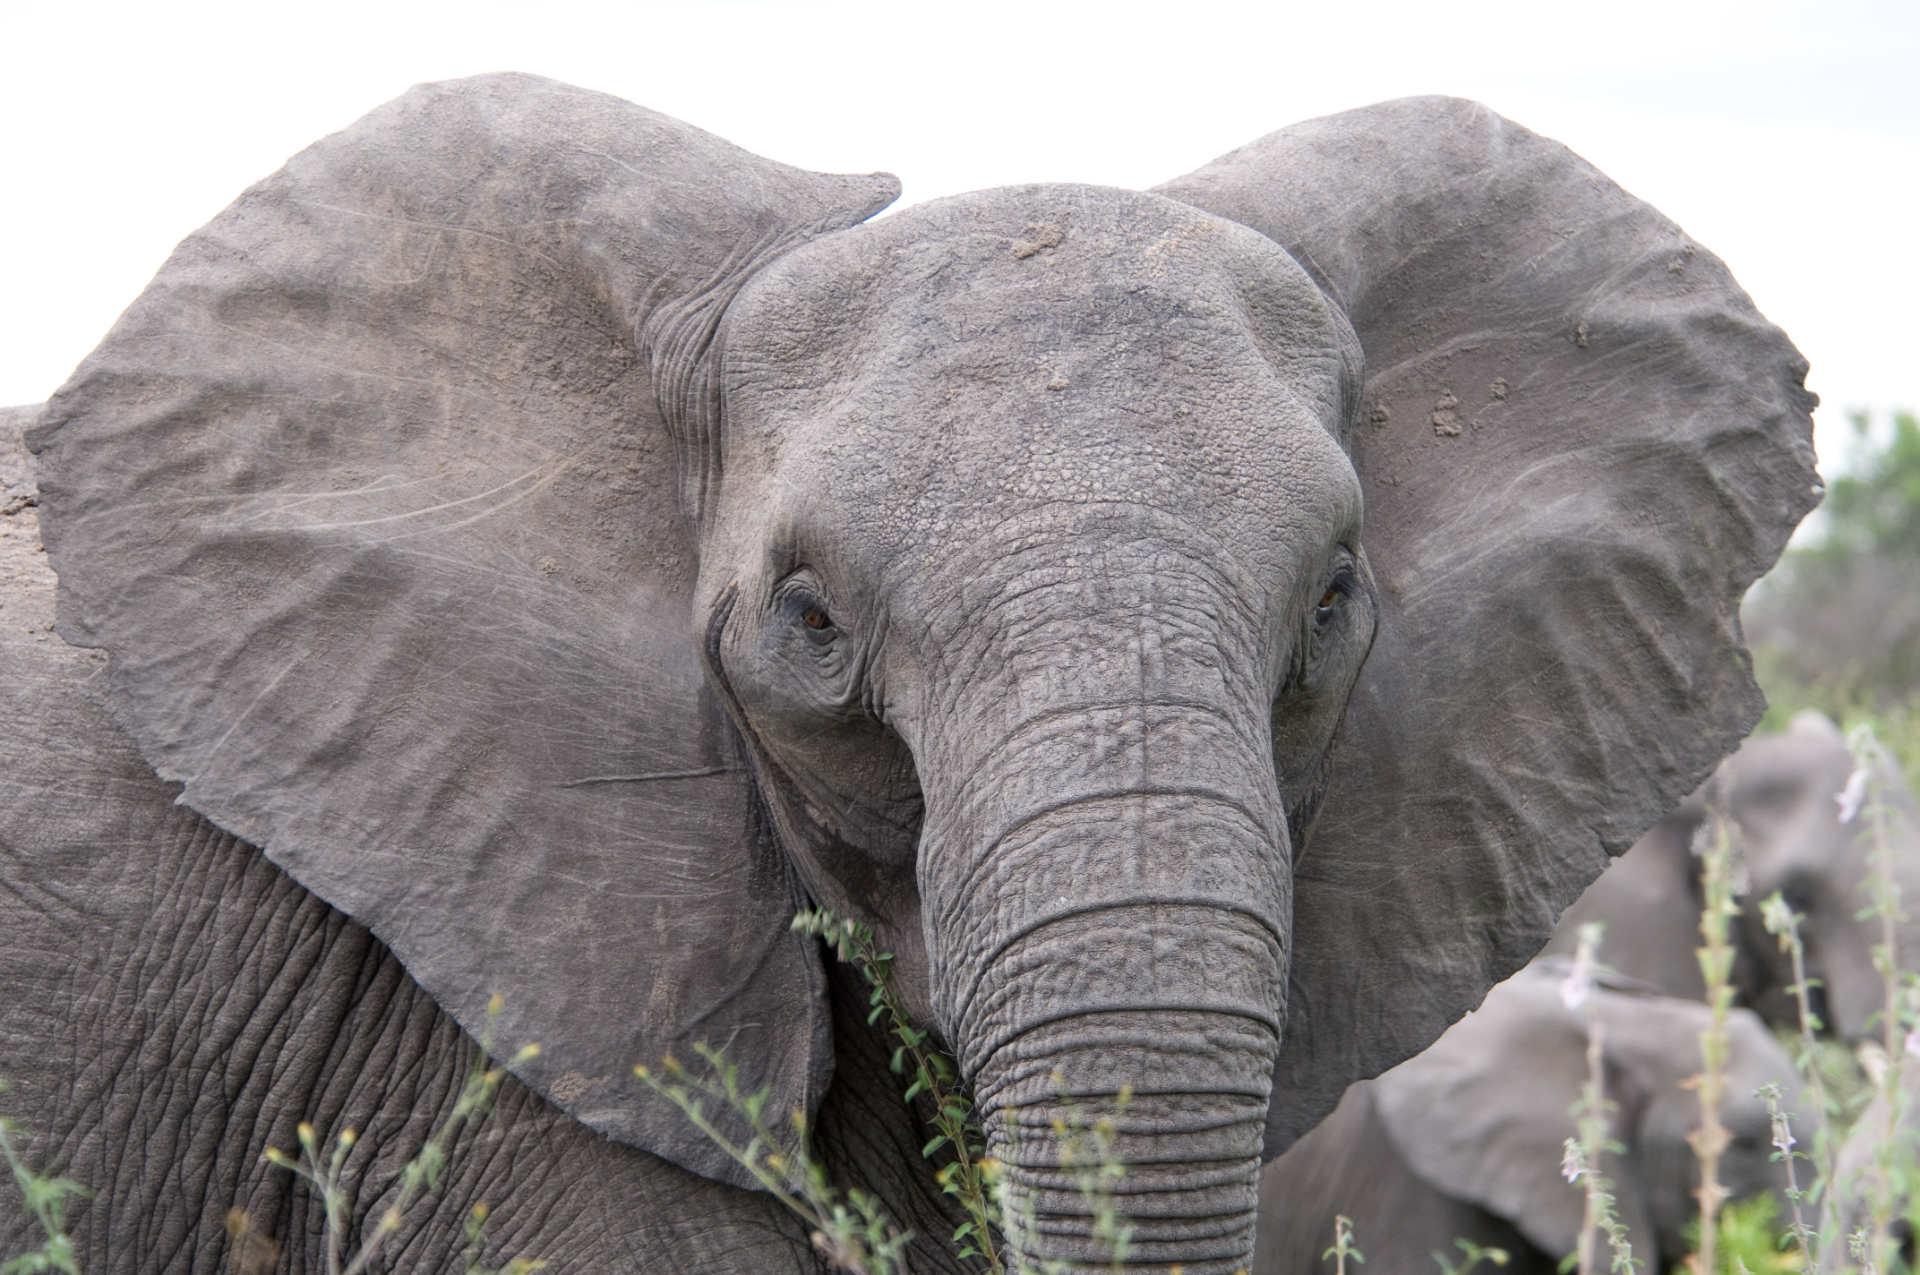 grote oren van de olifant, foto Chris Earson, Wikipedia